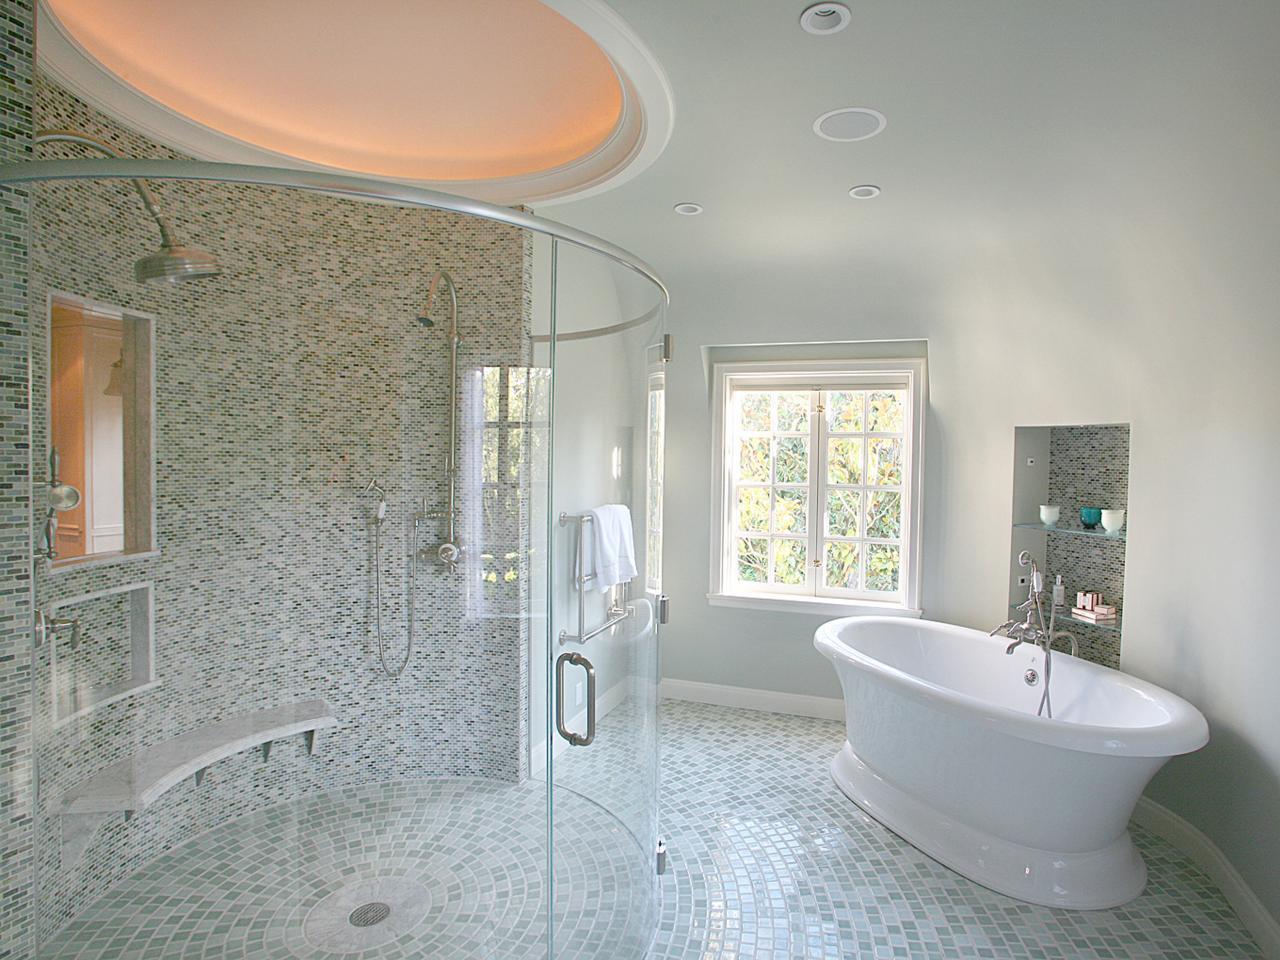 Bathroom Floor Options Bathroom Floor Buying Advice GGZIXNC